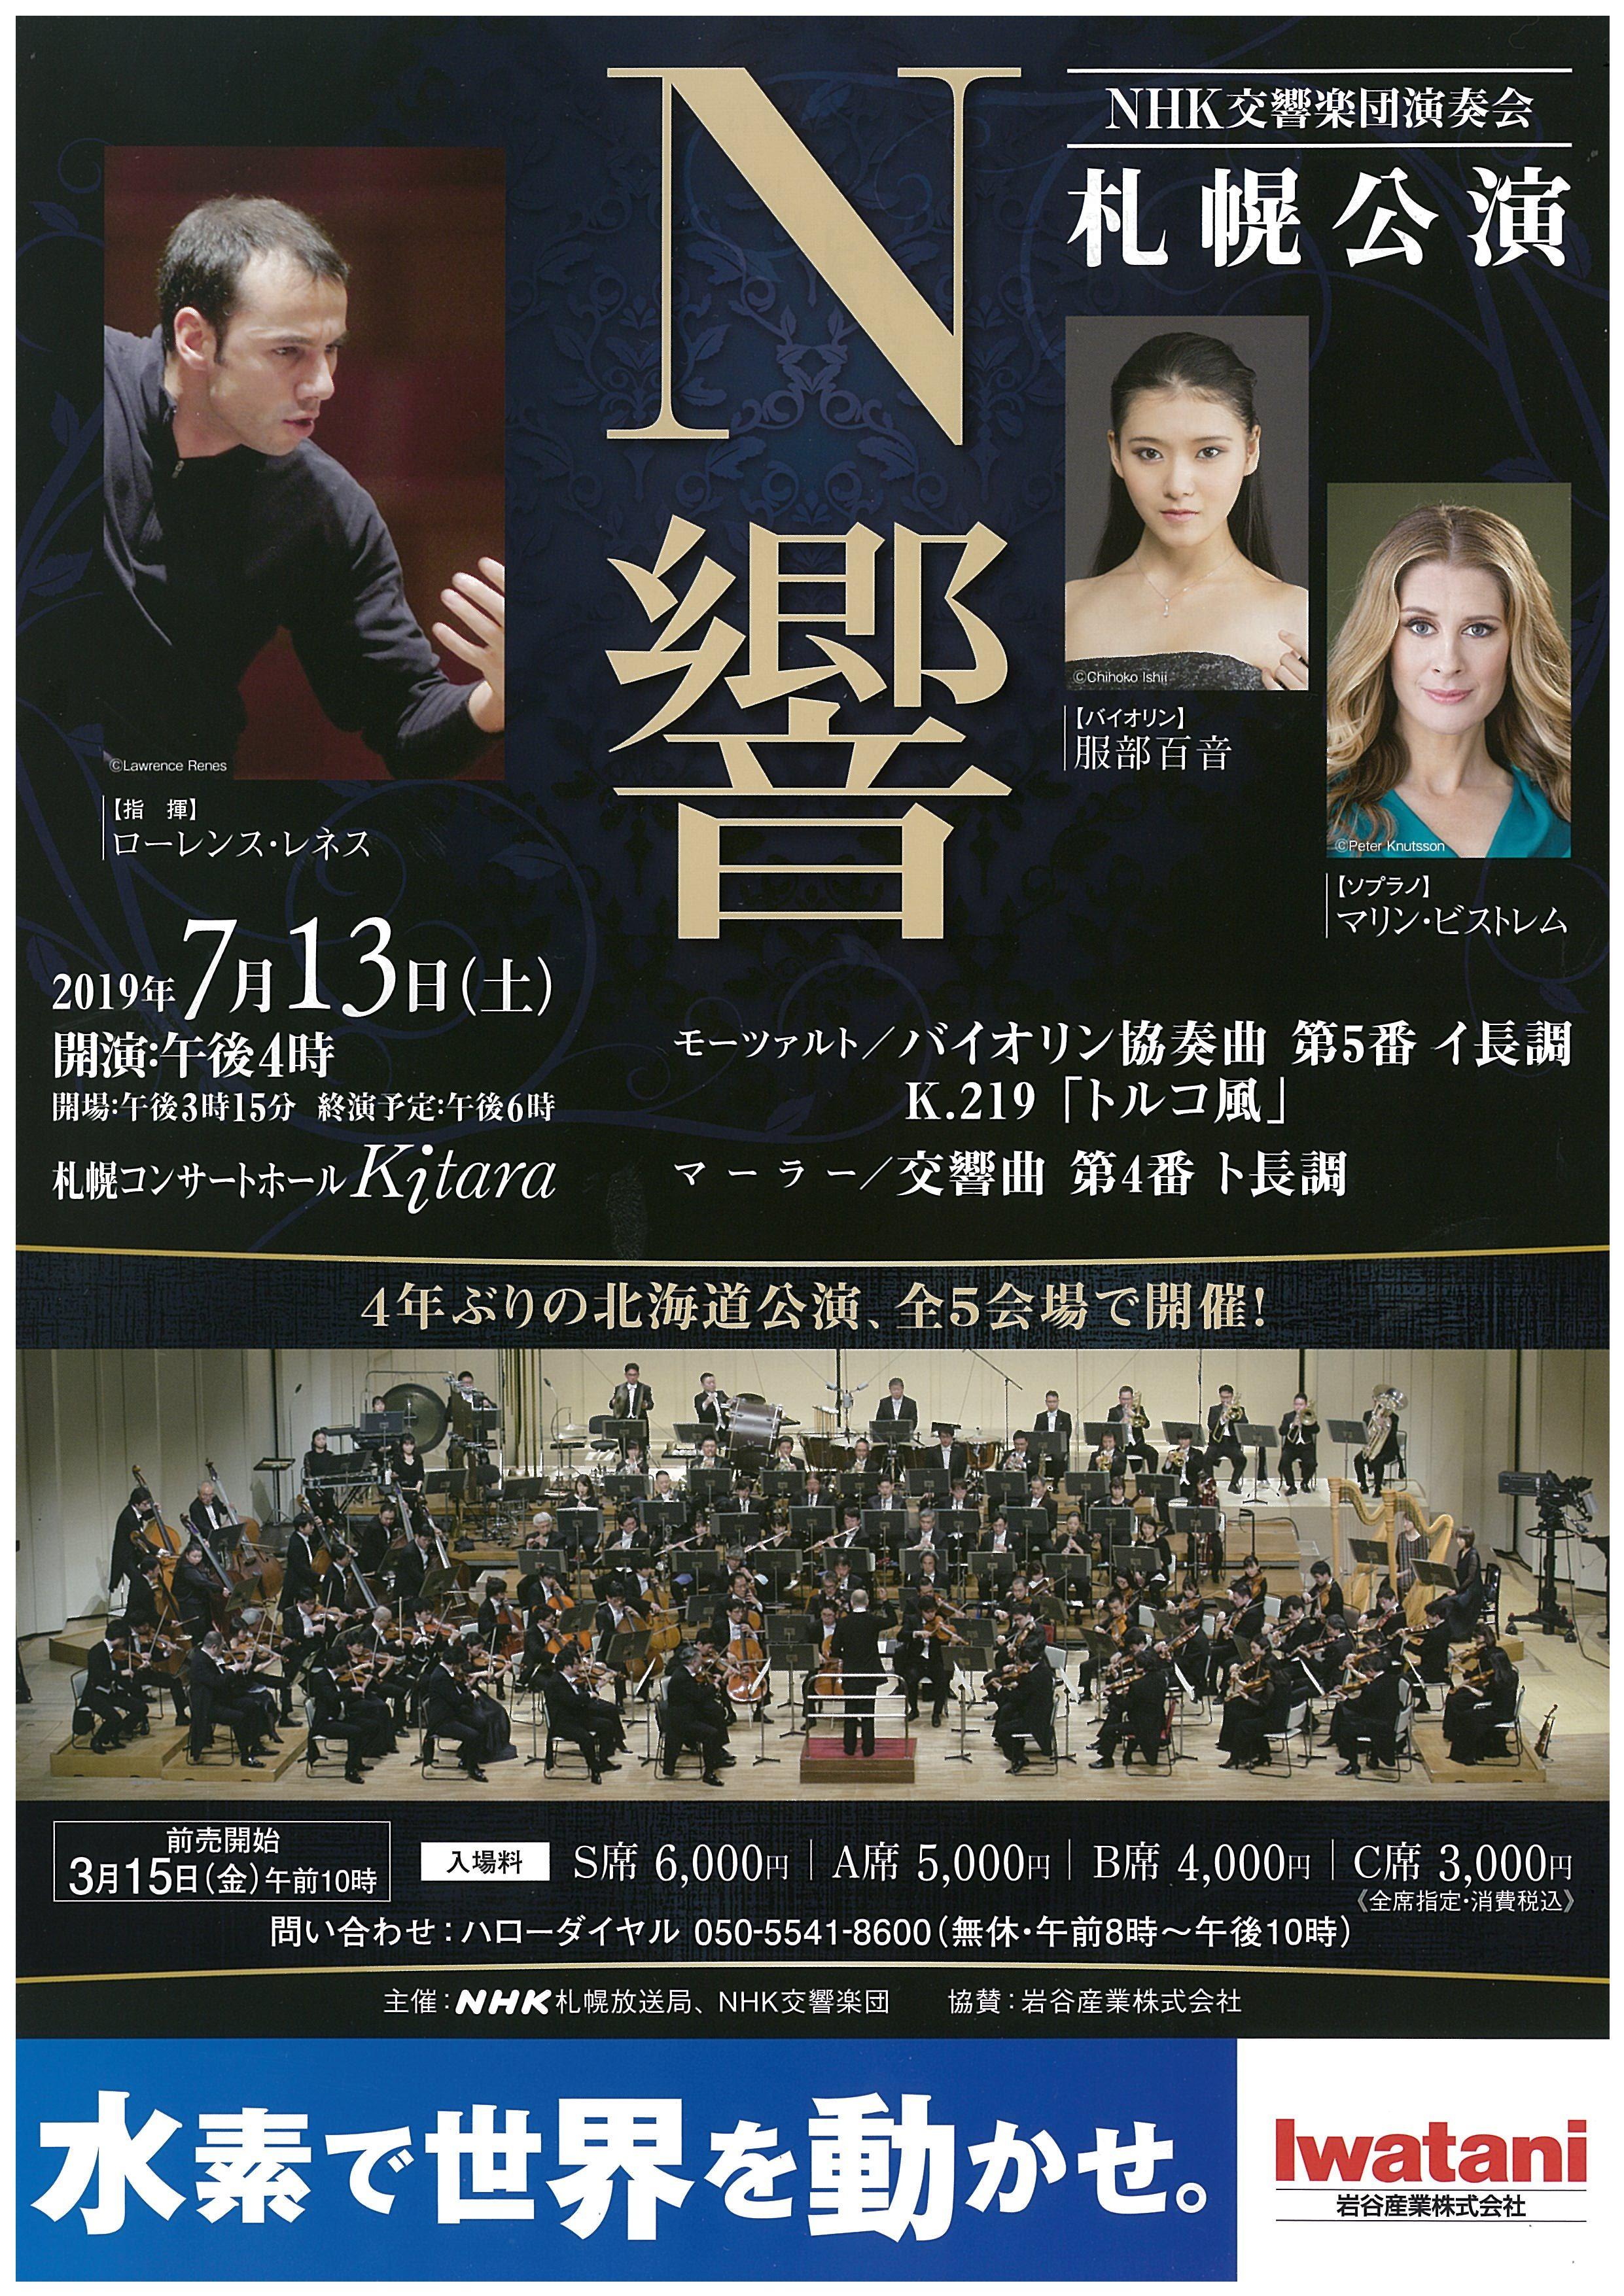 NHK交響楽団演奏会 札幌公演 イメージ画像